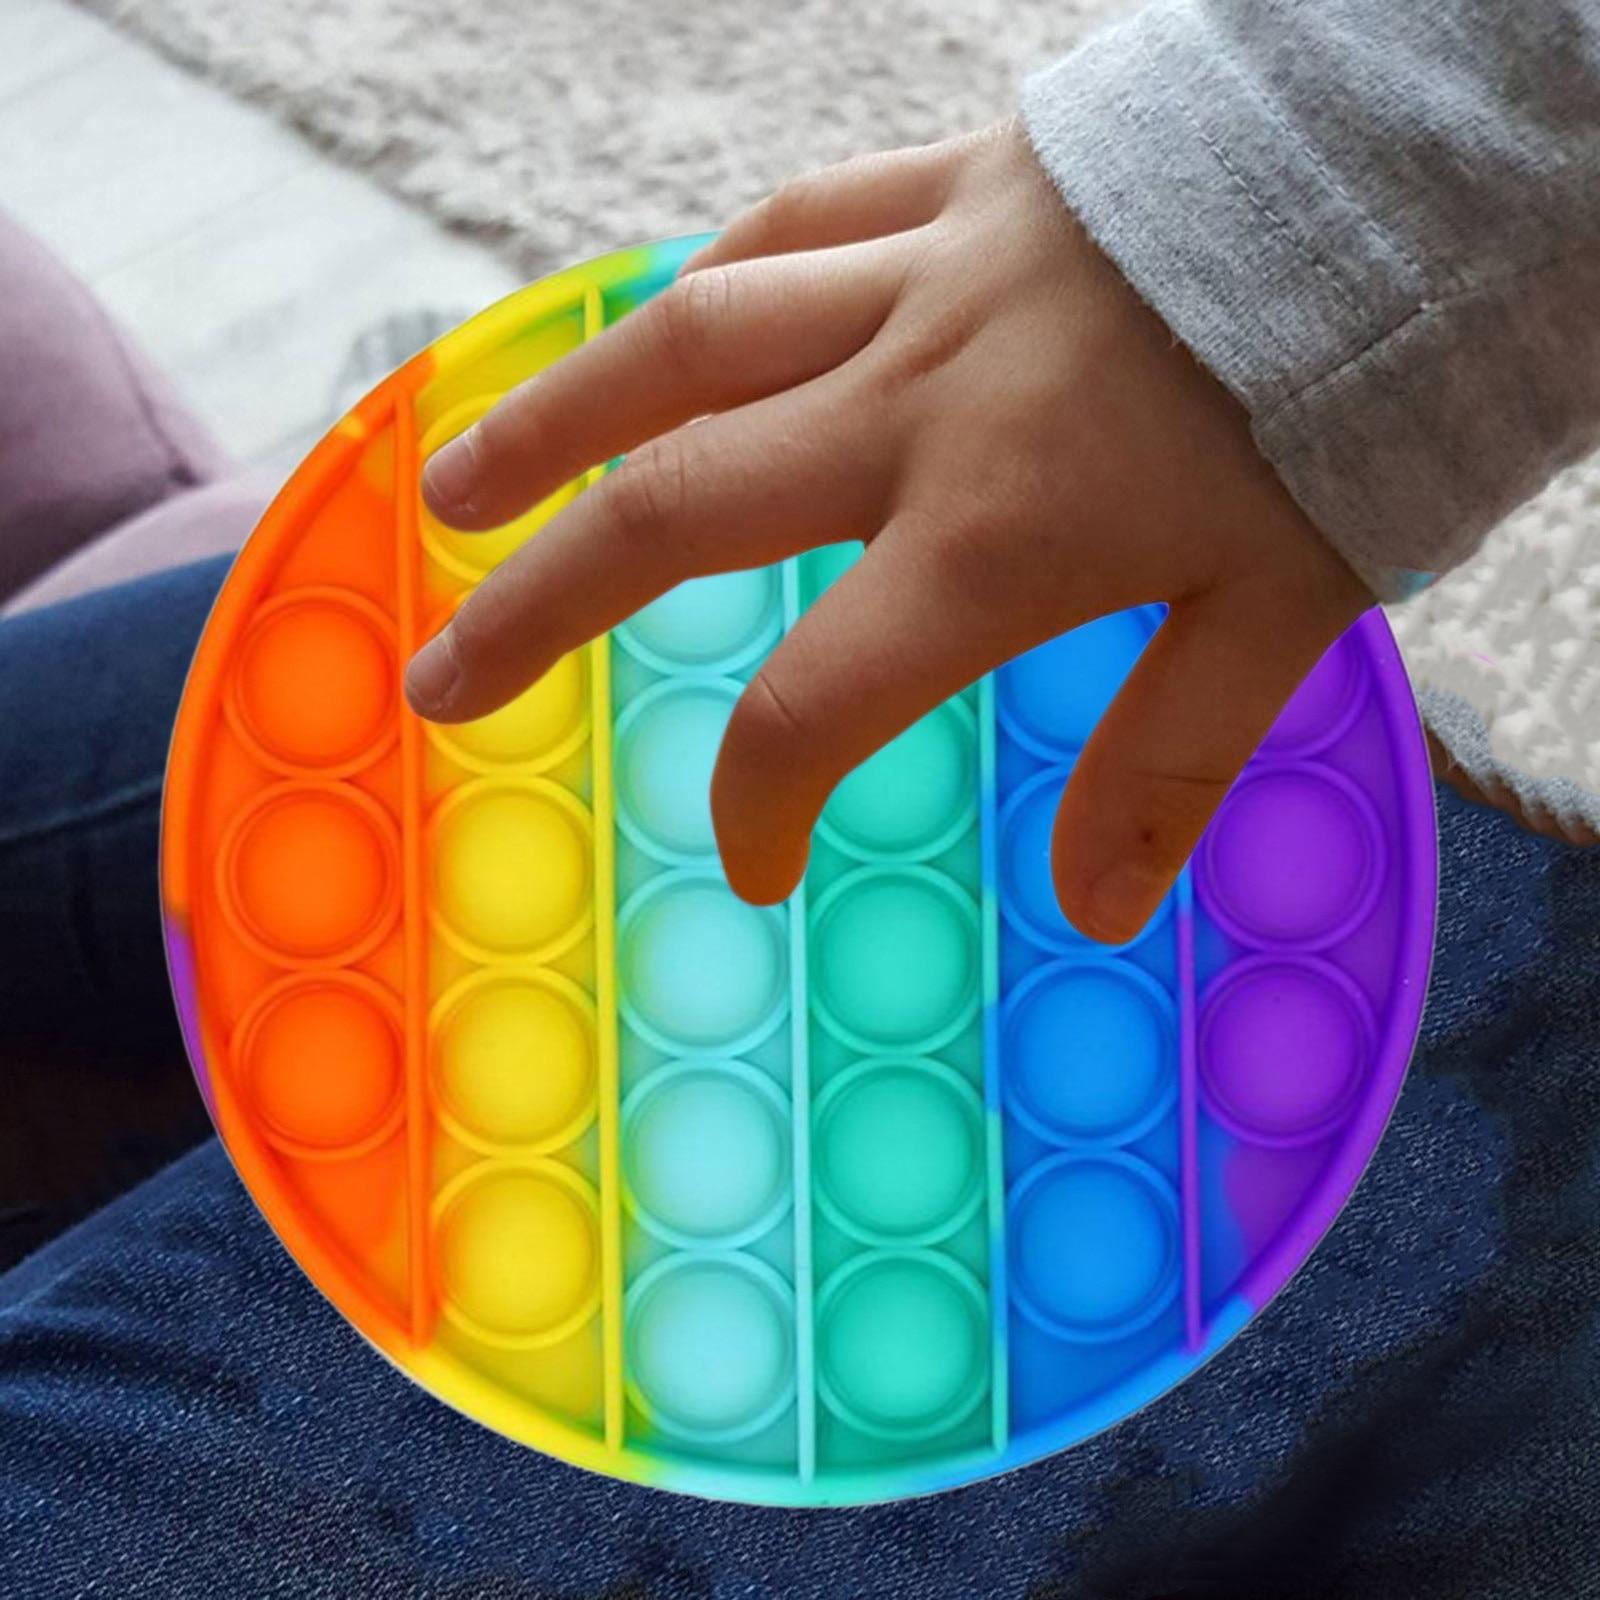 Stress Reliever Toys Bubble-Sensory-Toy Autism Needs Pops-It-Fidget Squishy Push-Pops img3